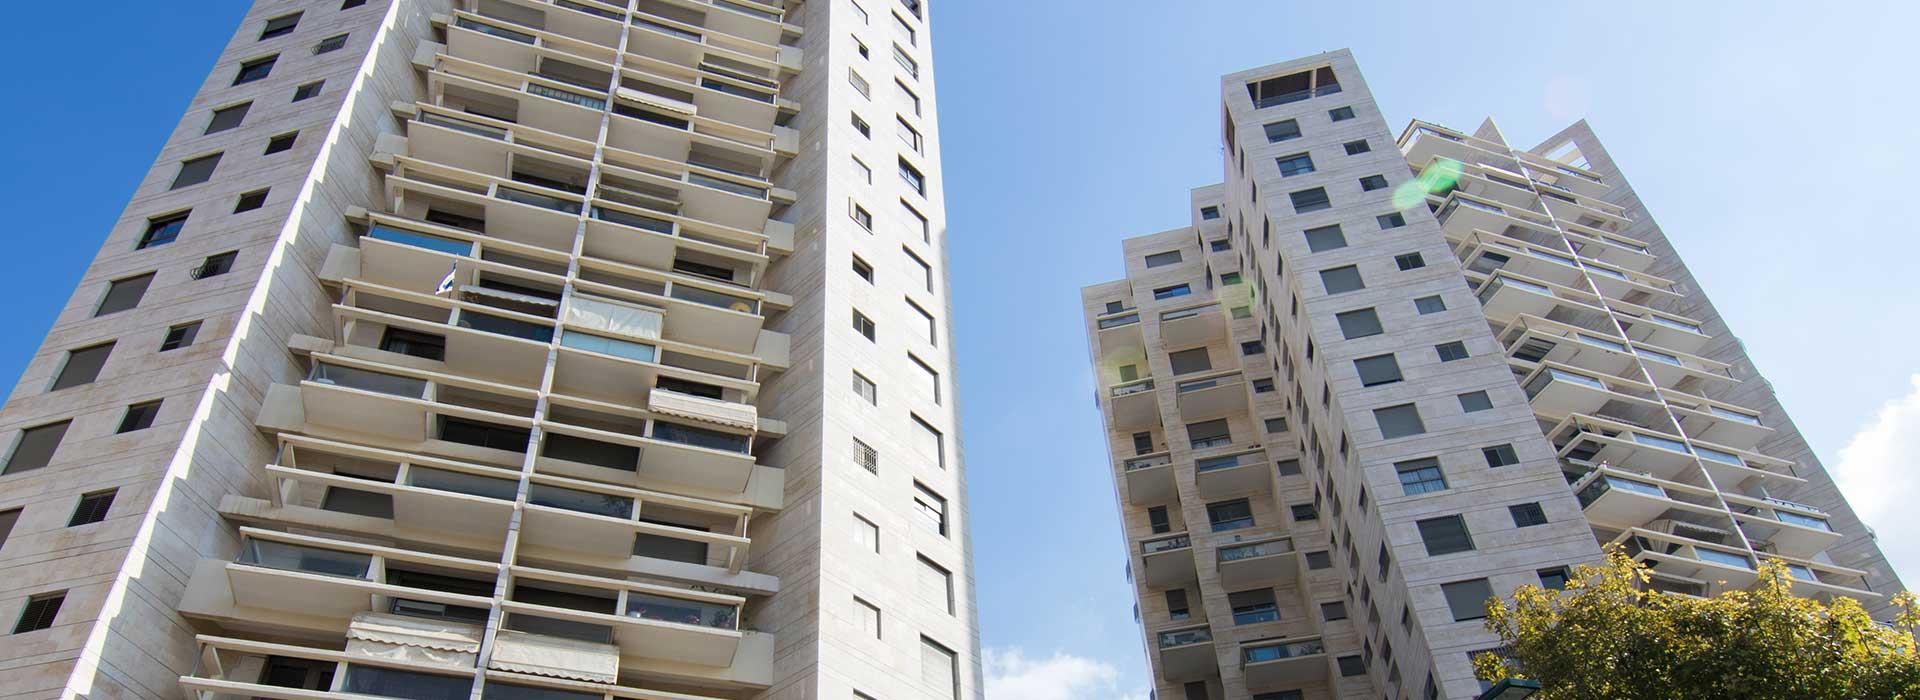 sliders-buildings-aloneiborohov